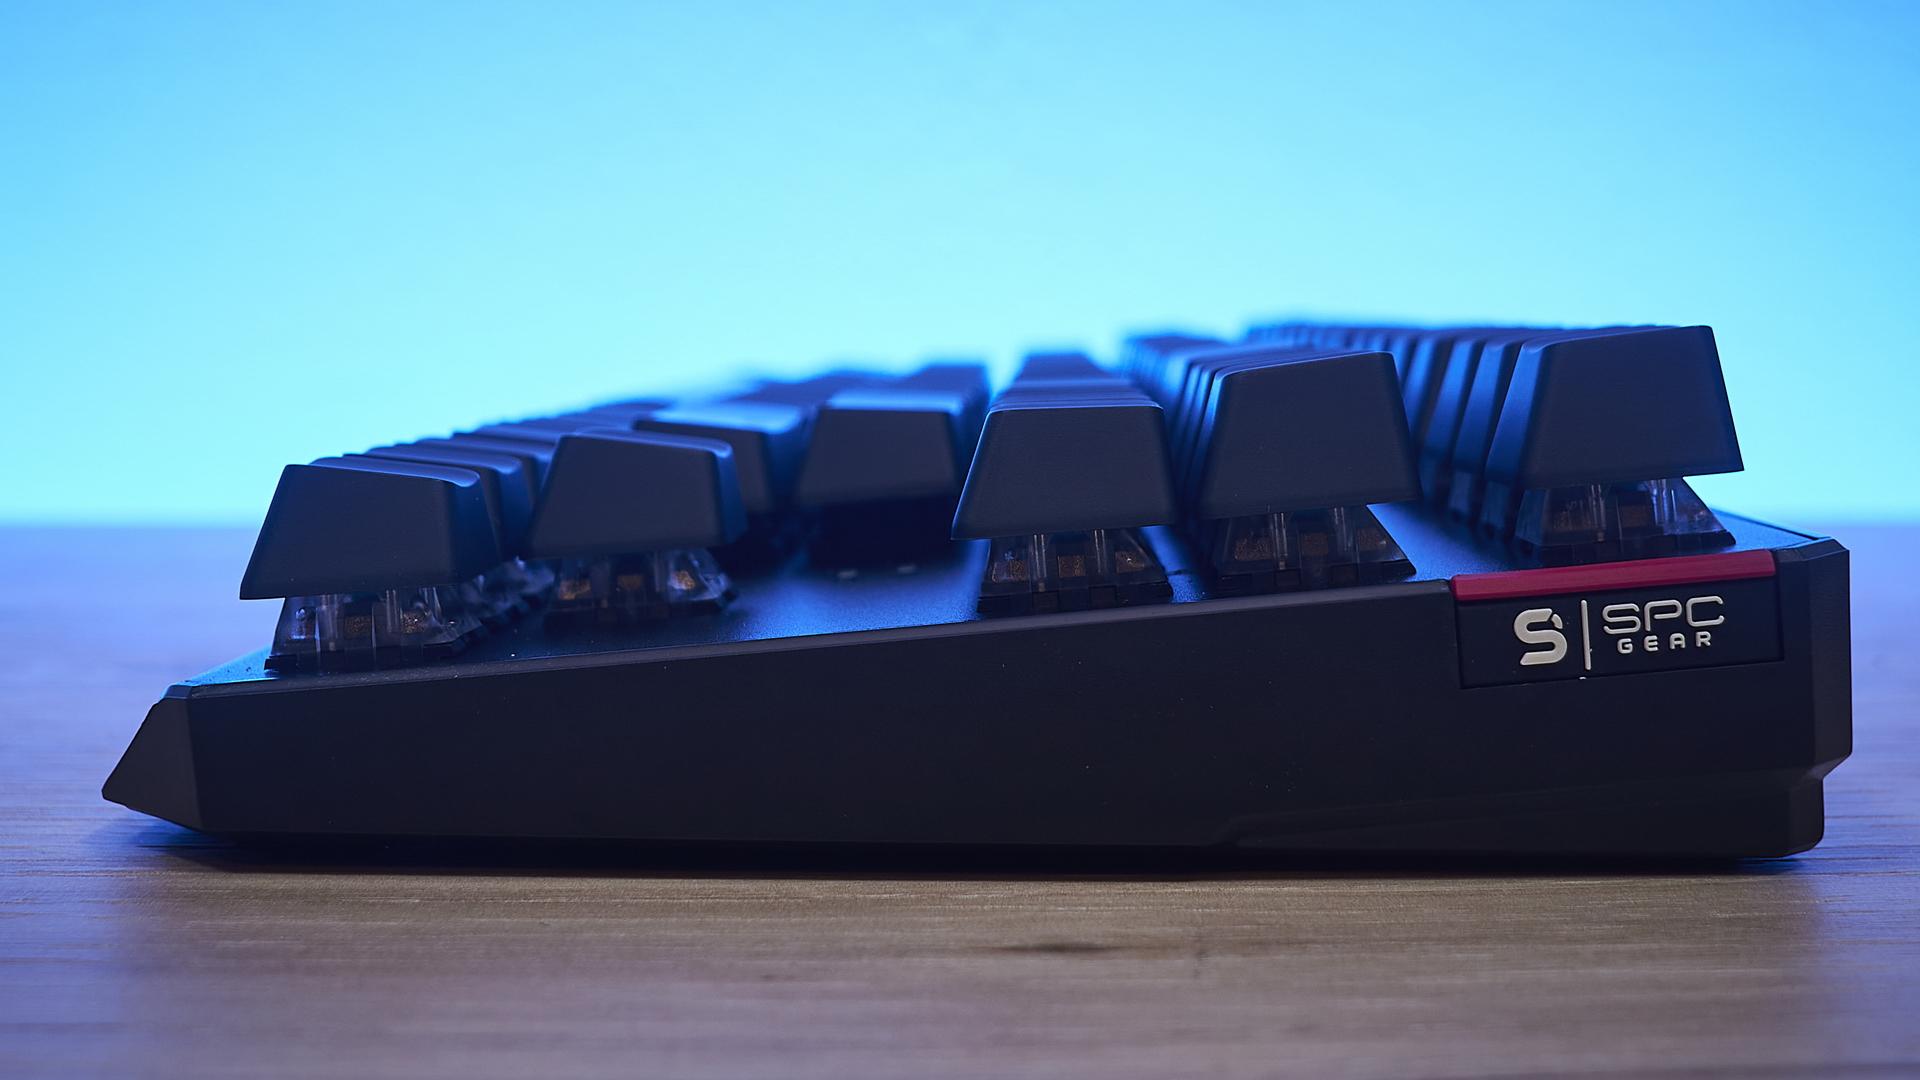 SPC Gear GK630 Tournament Kailh RGB review | WASD.ro